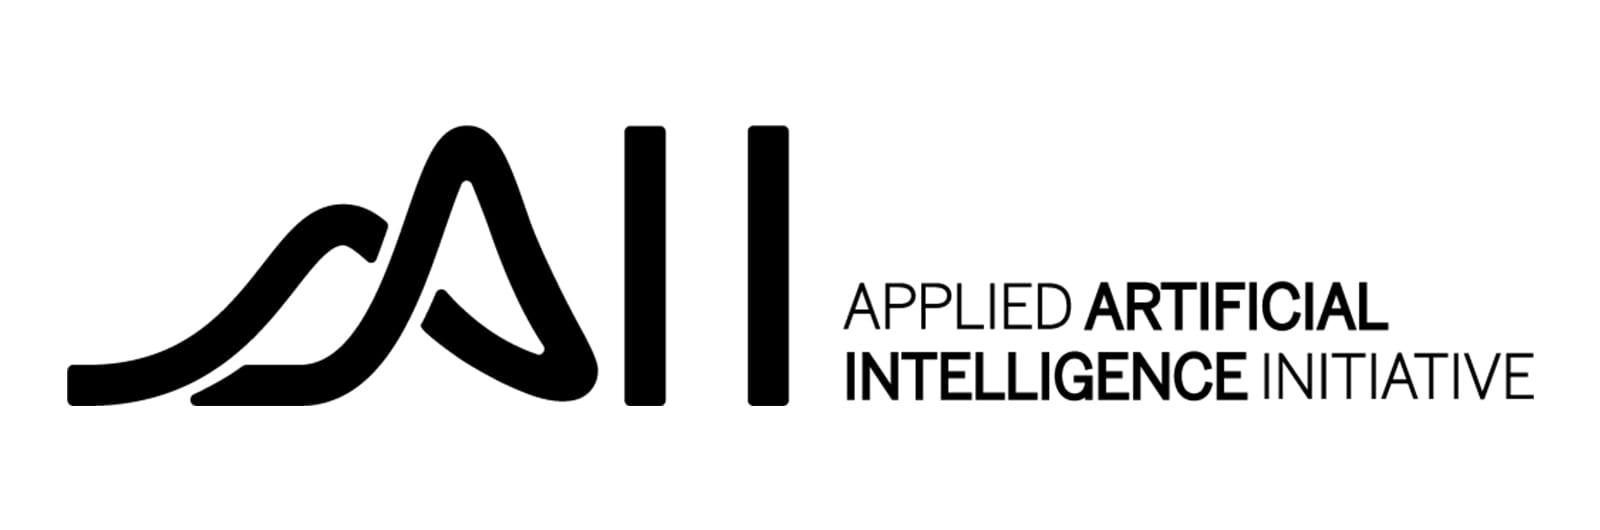 Applied Artificial Intelligence Initiative (AAII)